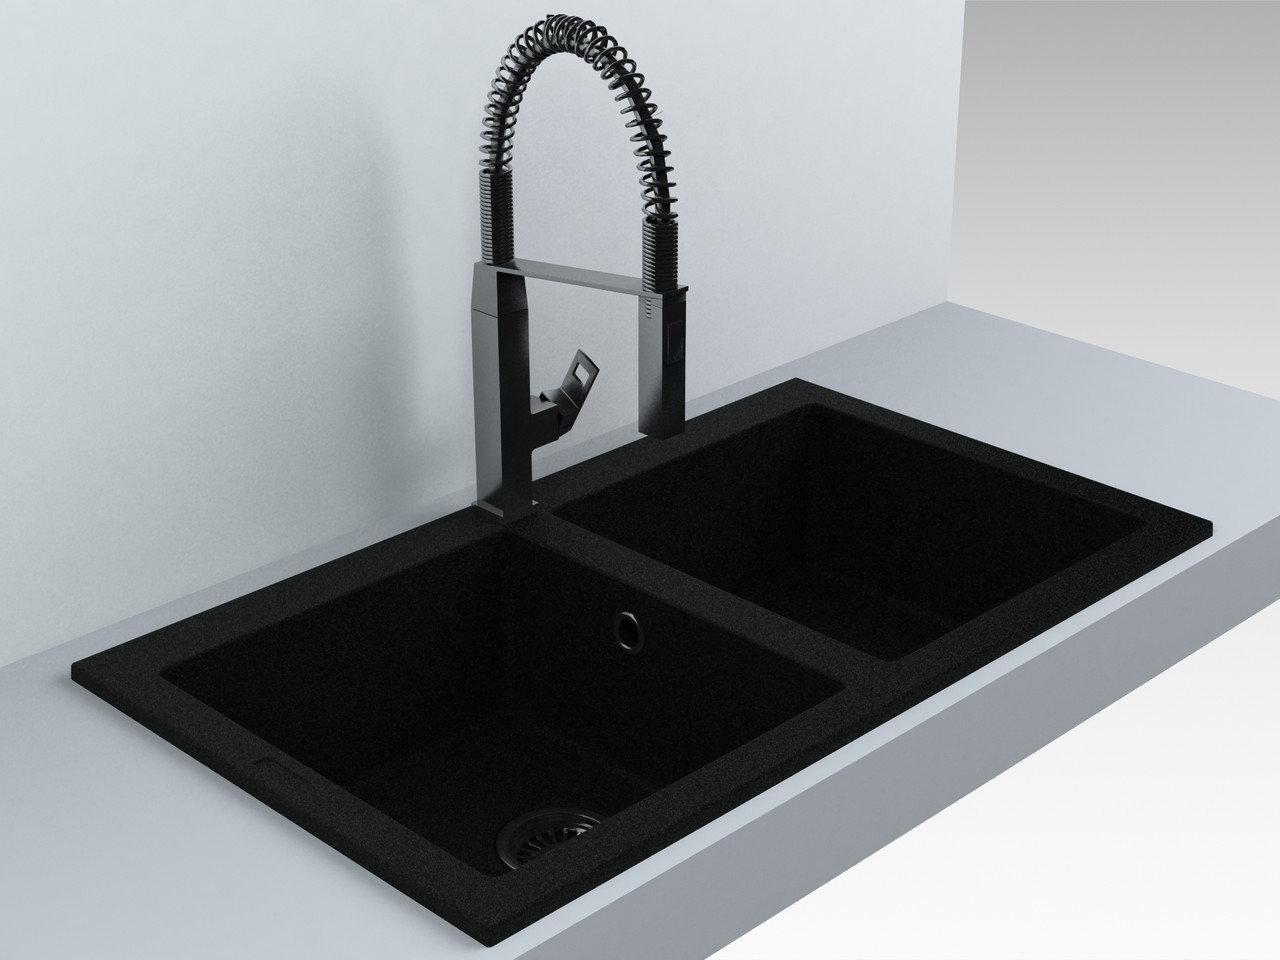 Кухонная мойка Miraggio Westeros Black